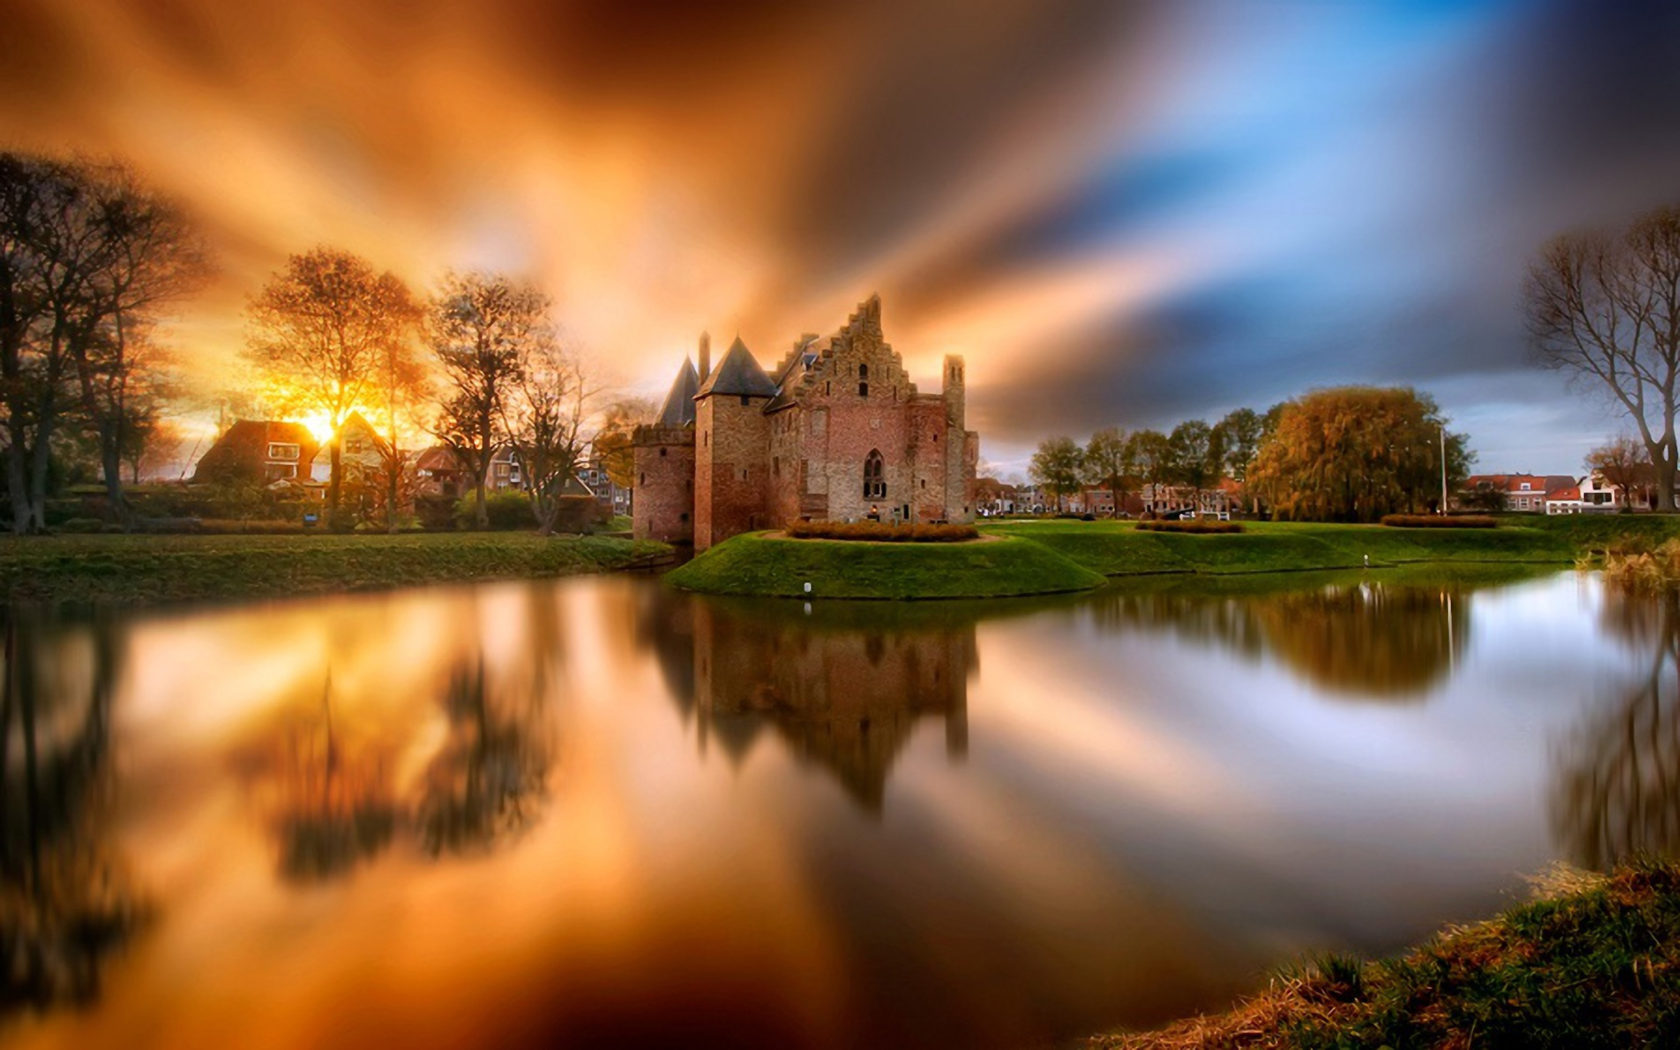 Star Wars Wallpaper Iphone X Castle Lake Sunset Netherlands Hd Wallpaper Wallpapers13 Com